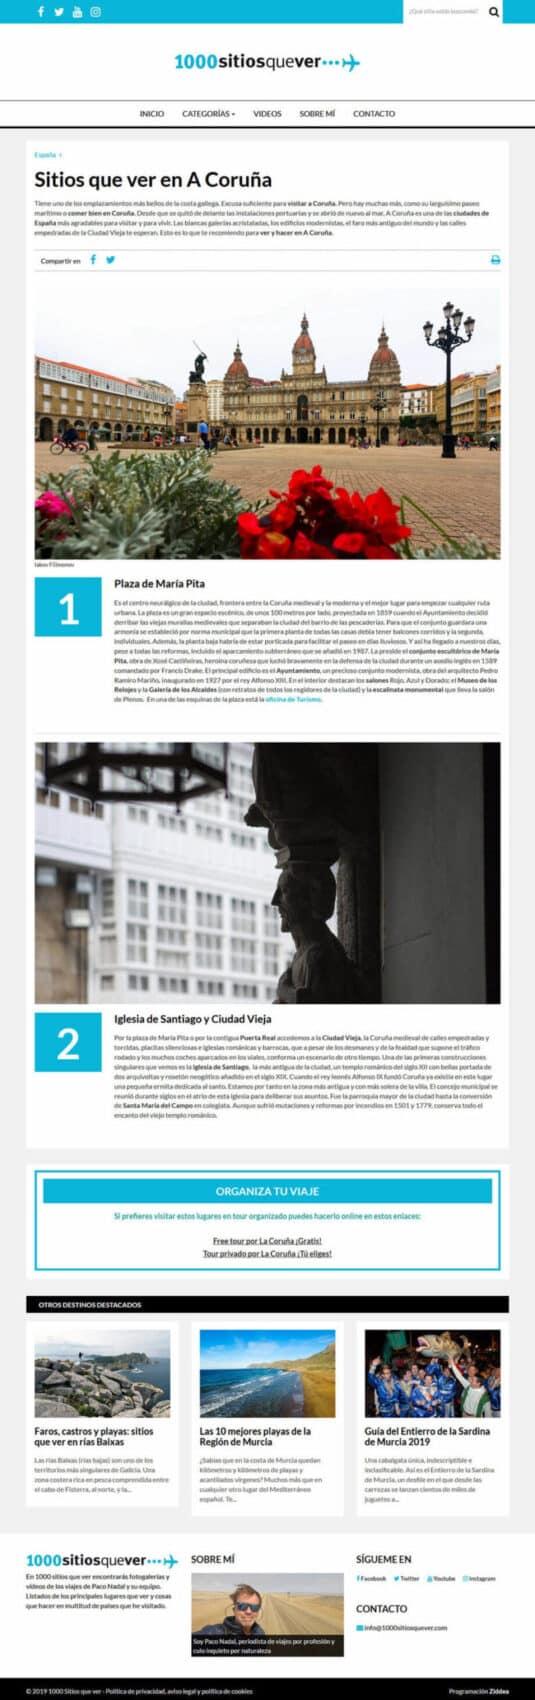 Blog para 1000 Sitios que ver por Paco Nadal